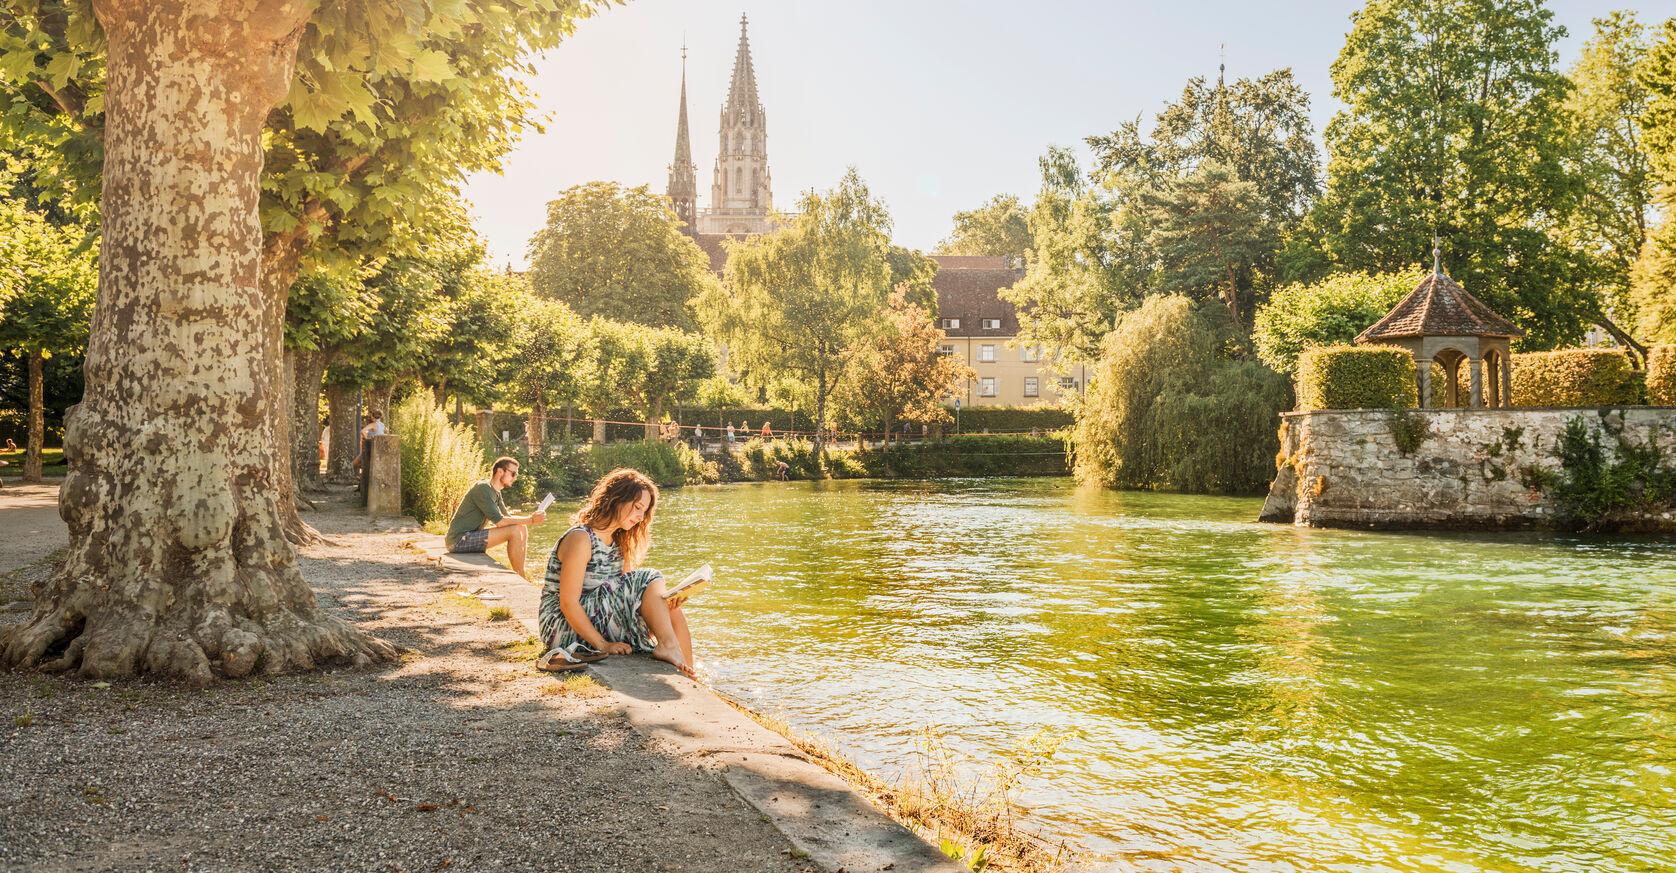 Konstanz-Stadtgarten-Muenster-02_Sommer_Copyright_MTK-Dagmar-Schwelle